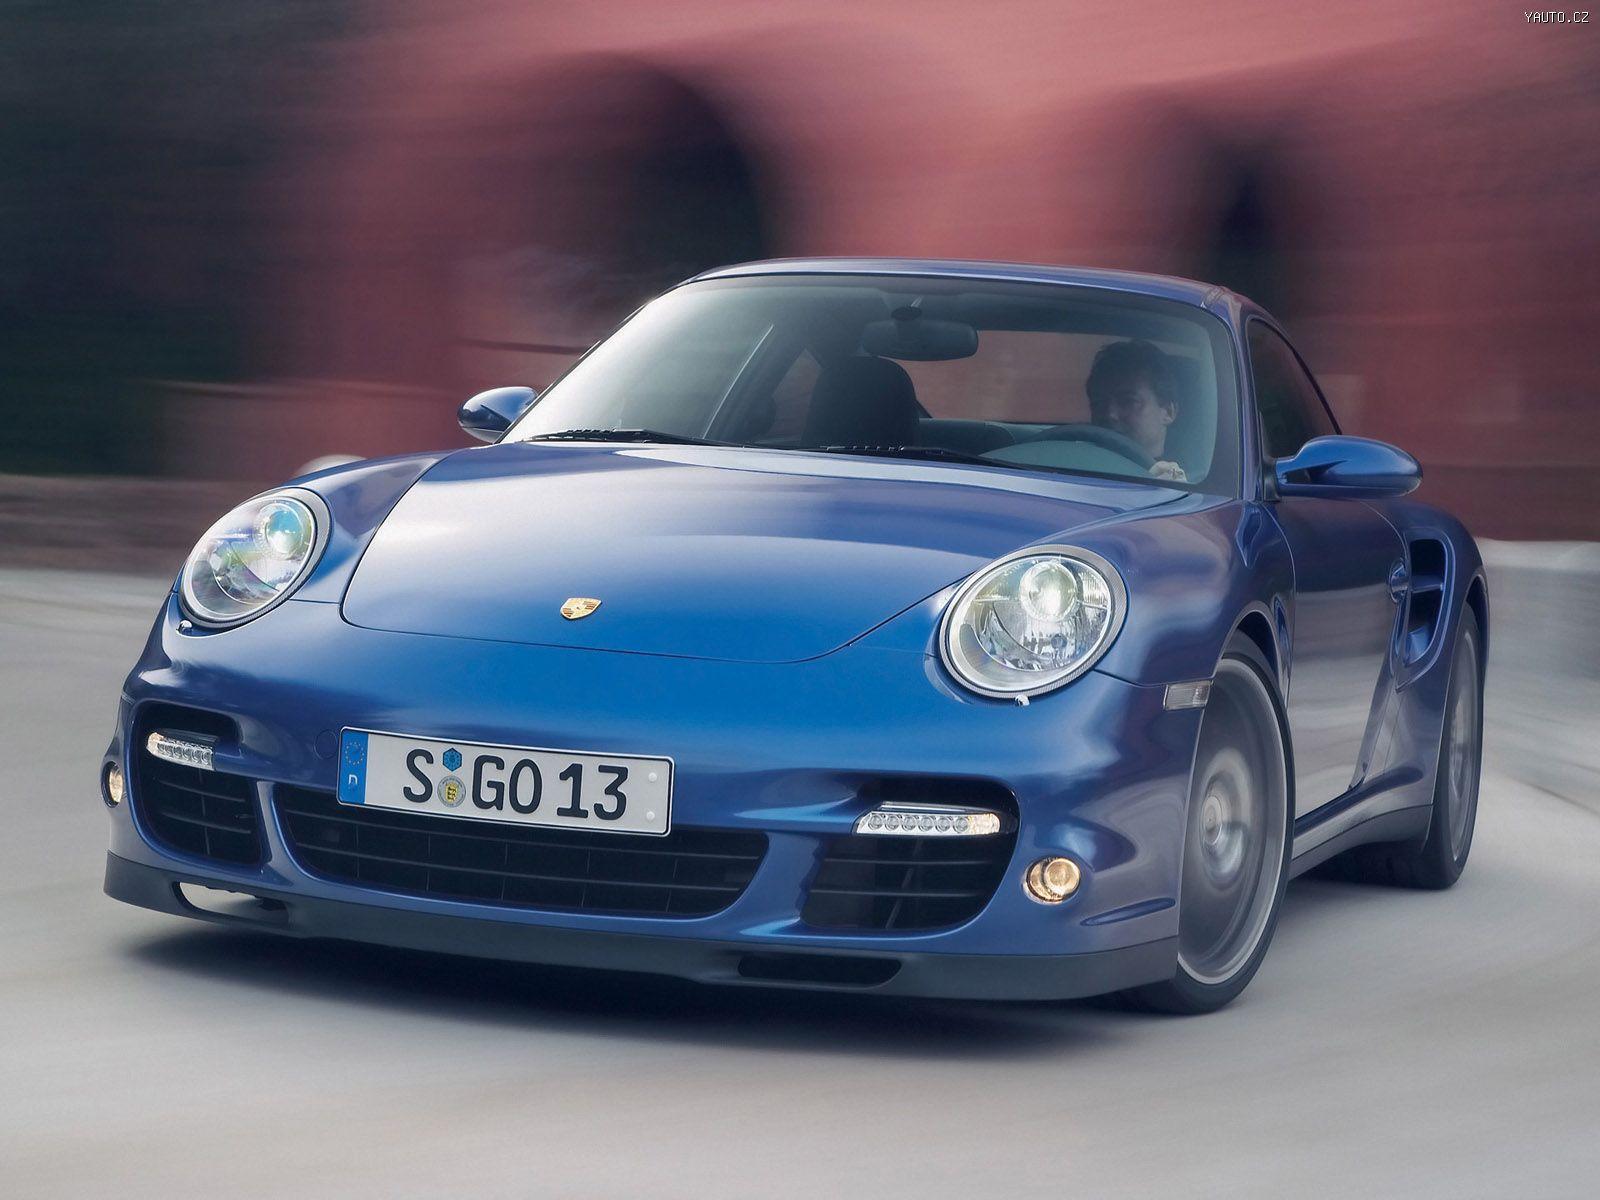 http://img.yauto.cz/tapety/Porsche_911_Turbo_2006_5.jpg